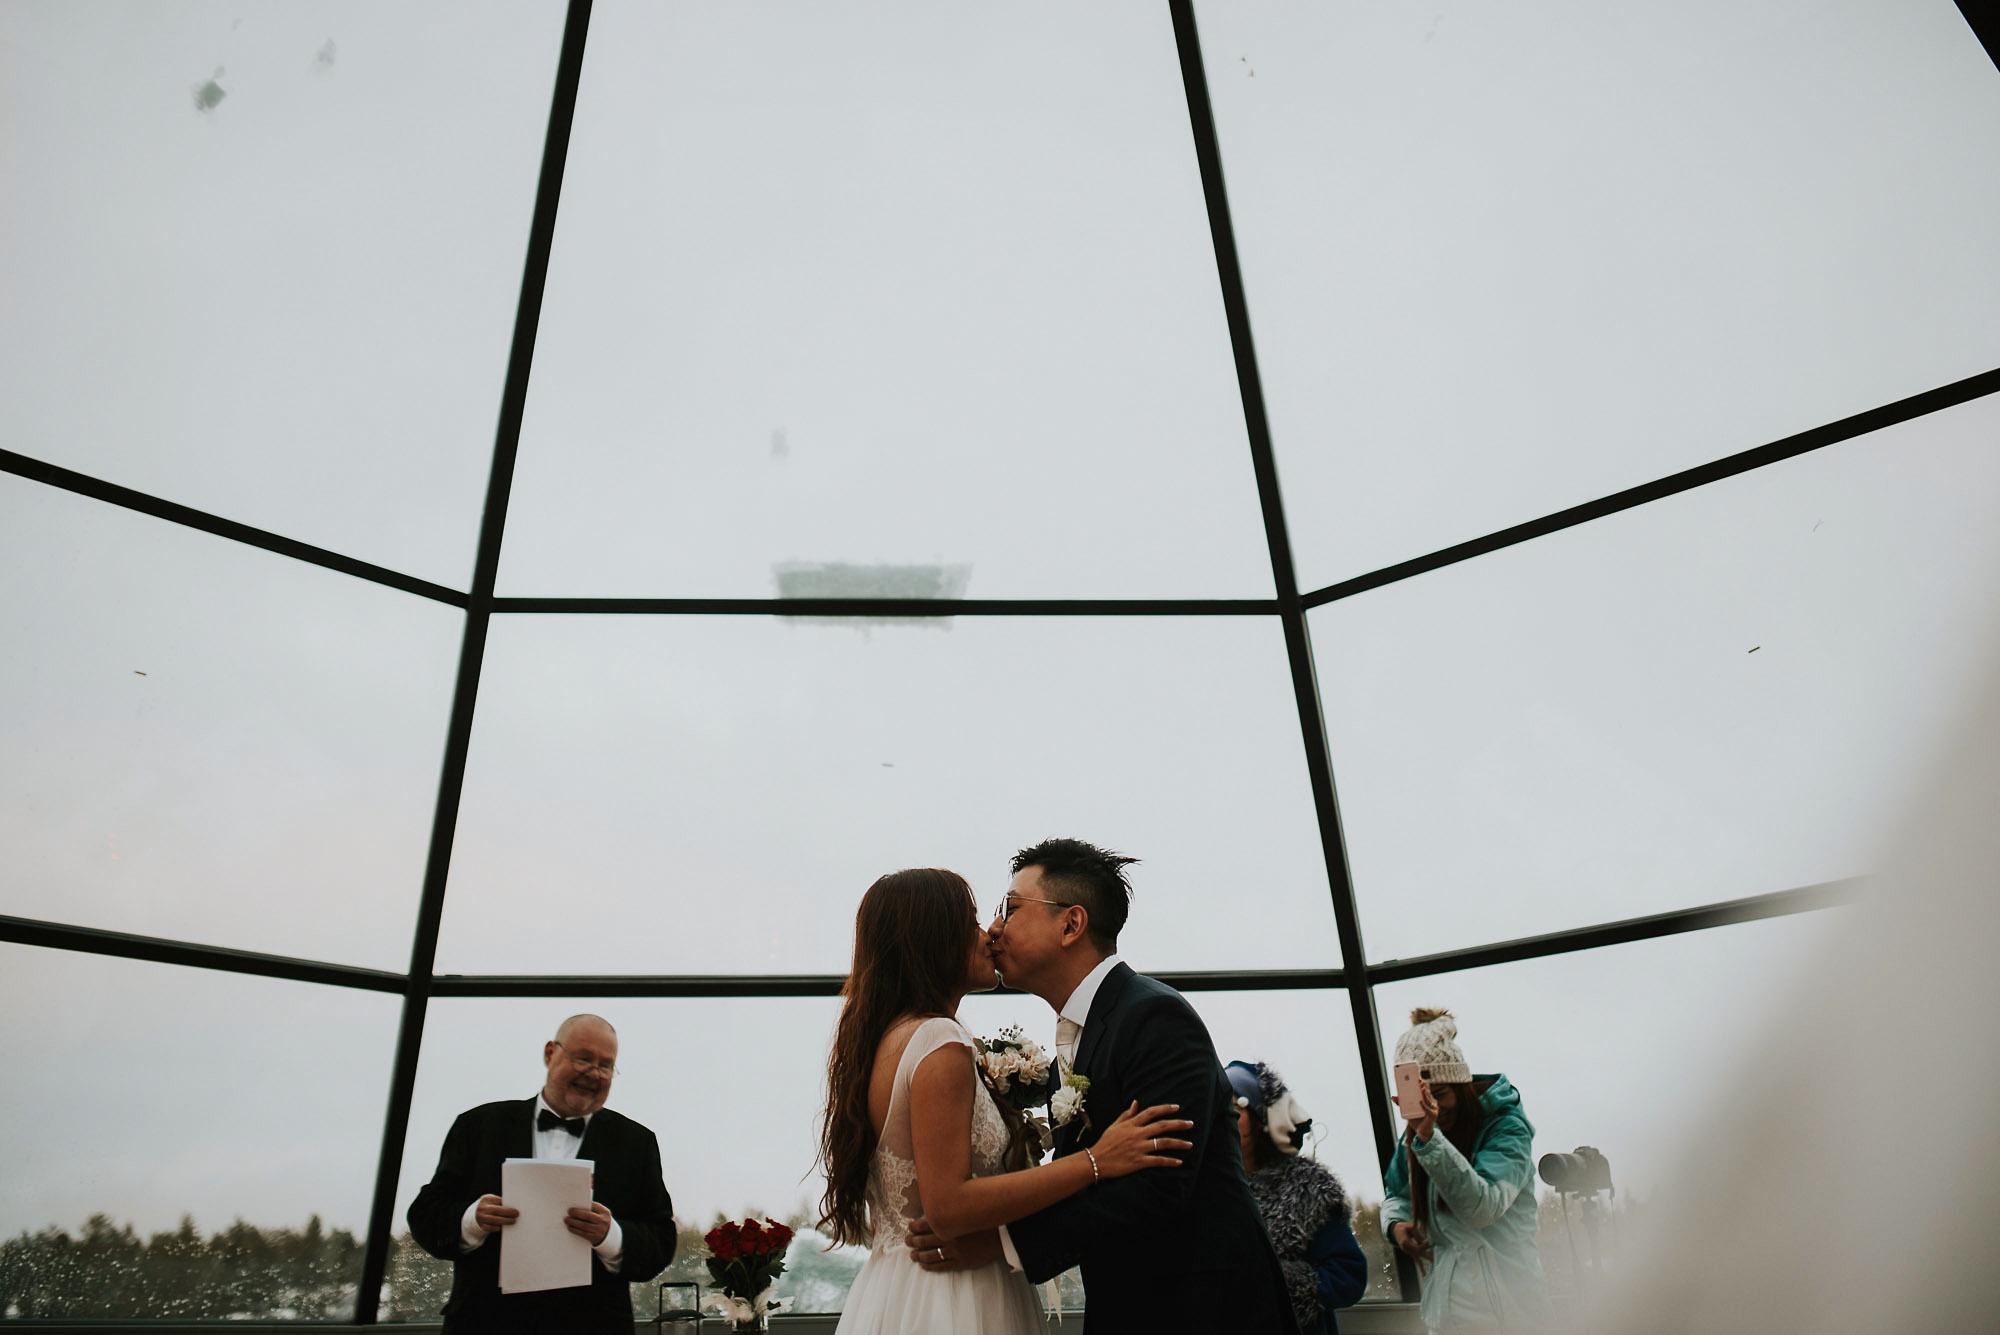 levi-ice-chapel-weddings-lapland-finland-photographer-jere-satamo-017-blog.jpg